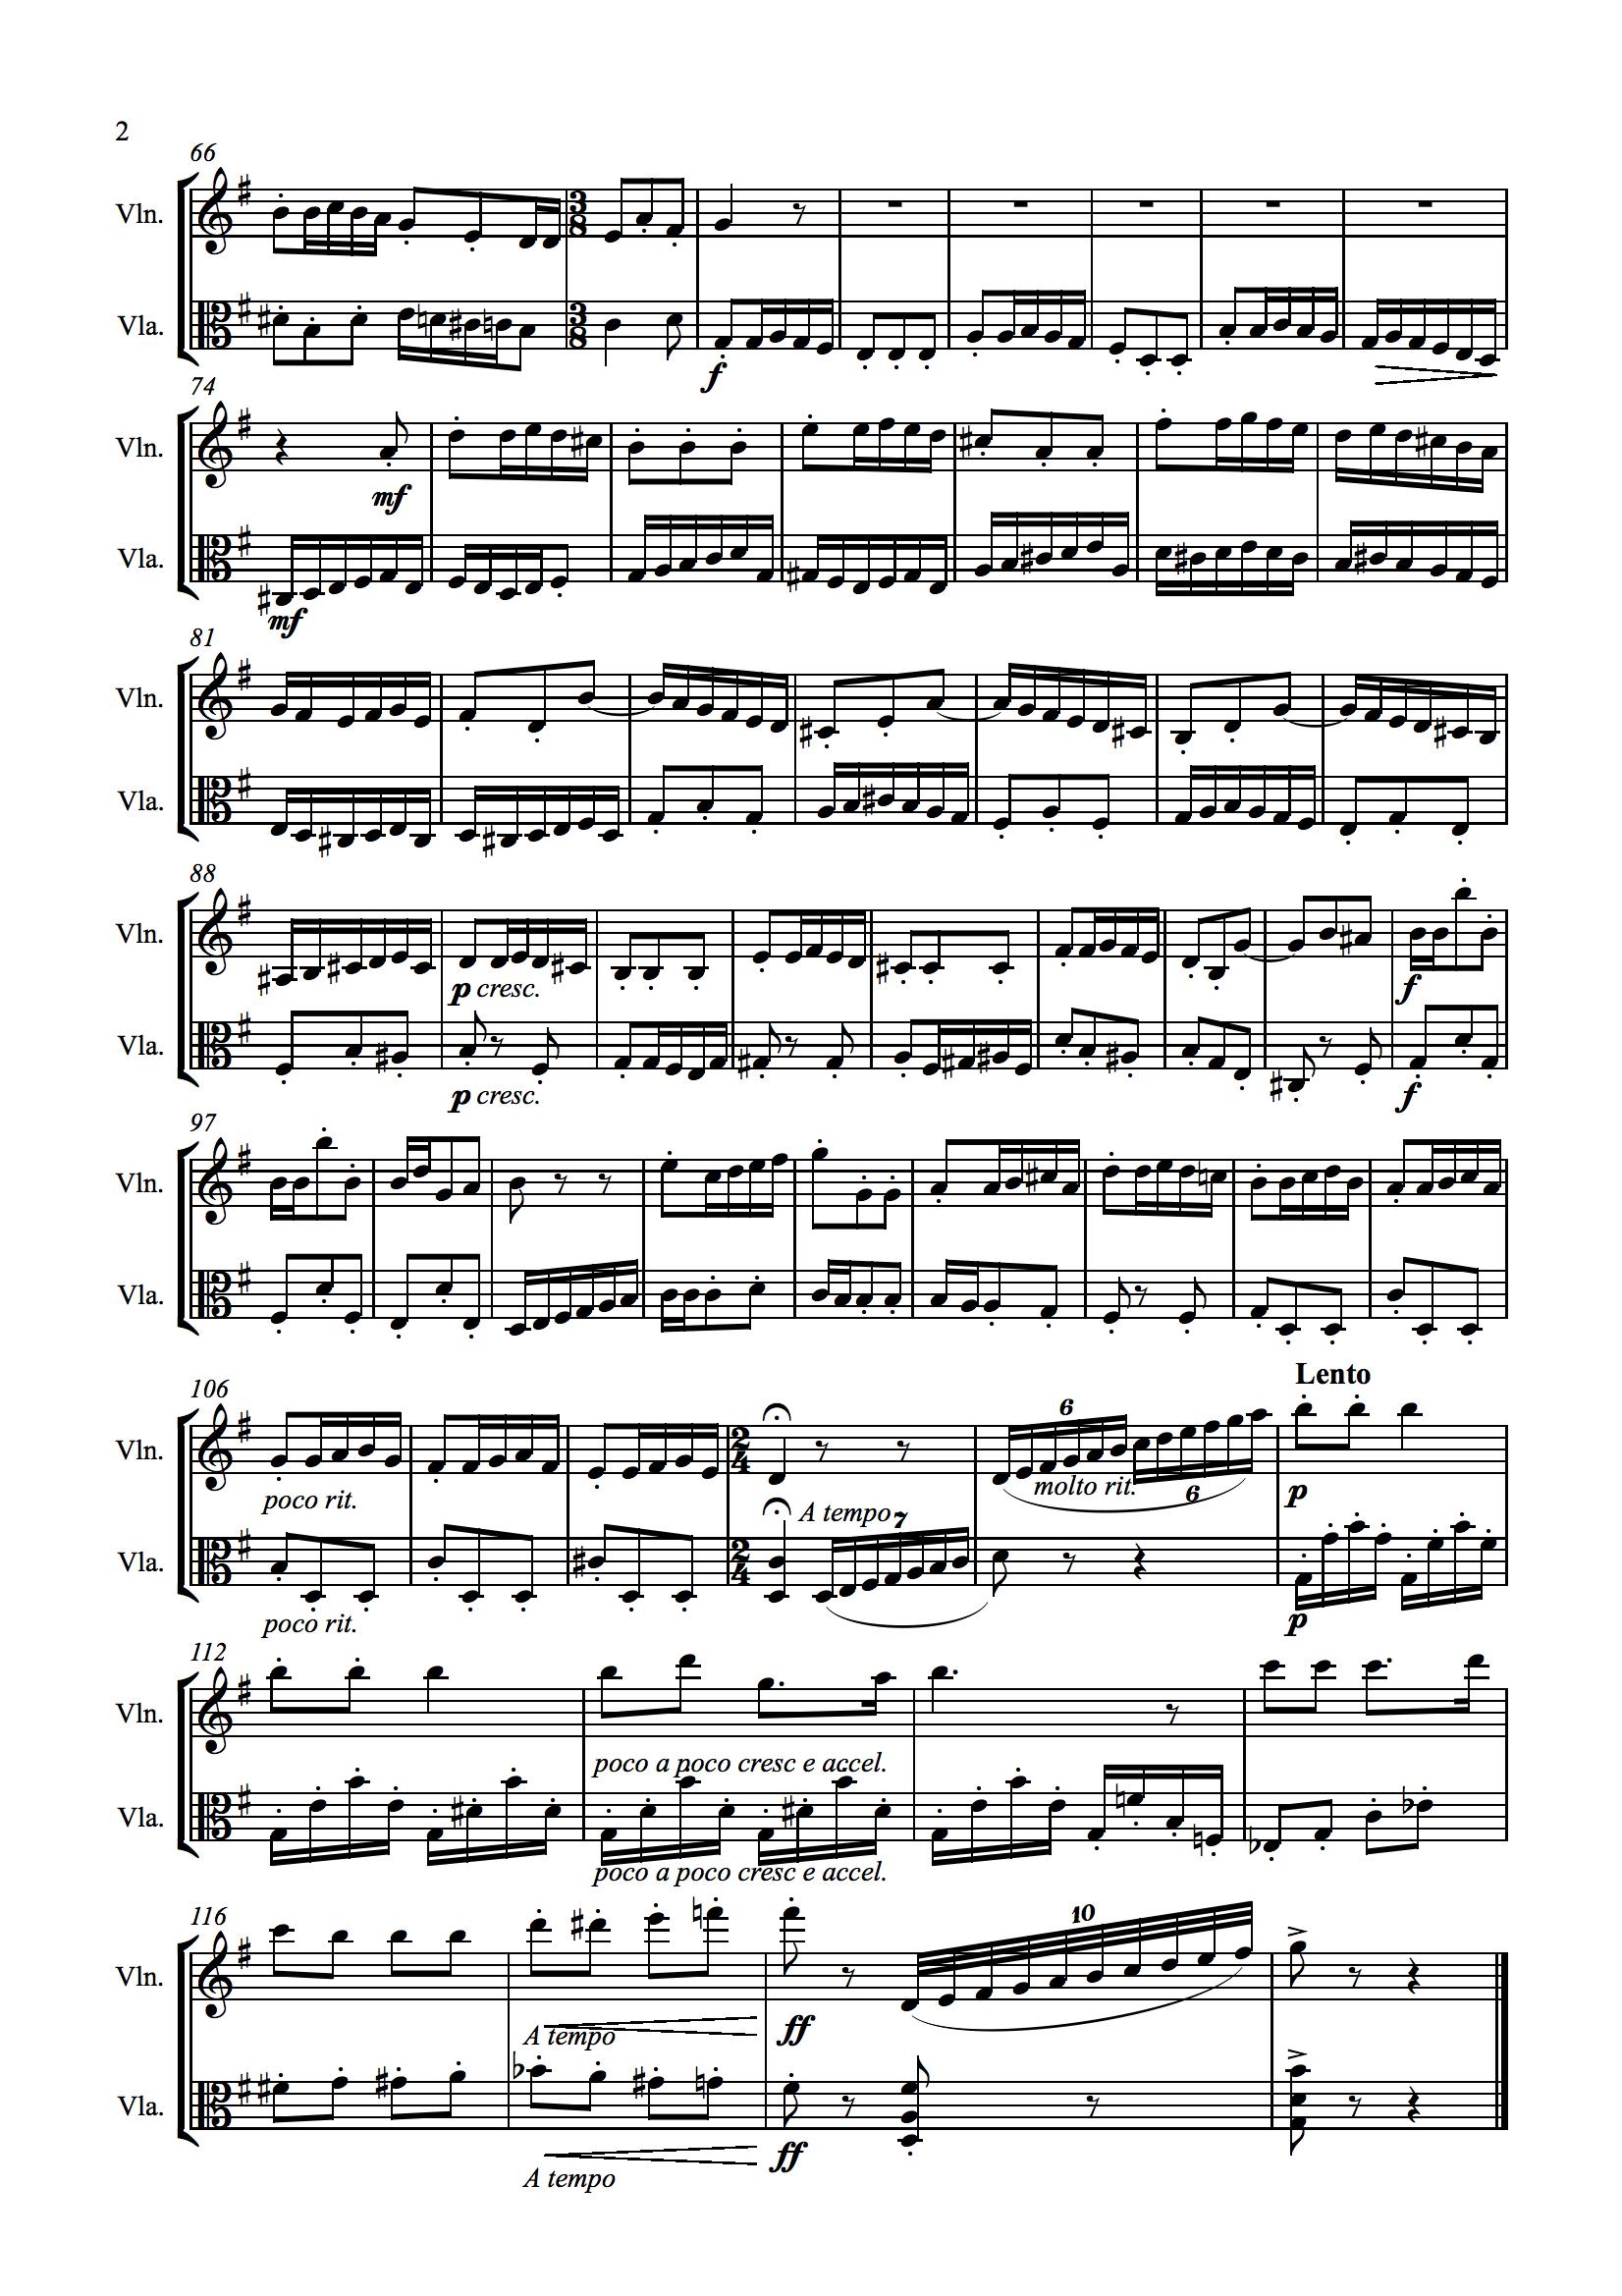 Christmas Medley - score (dragged) 1